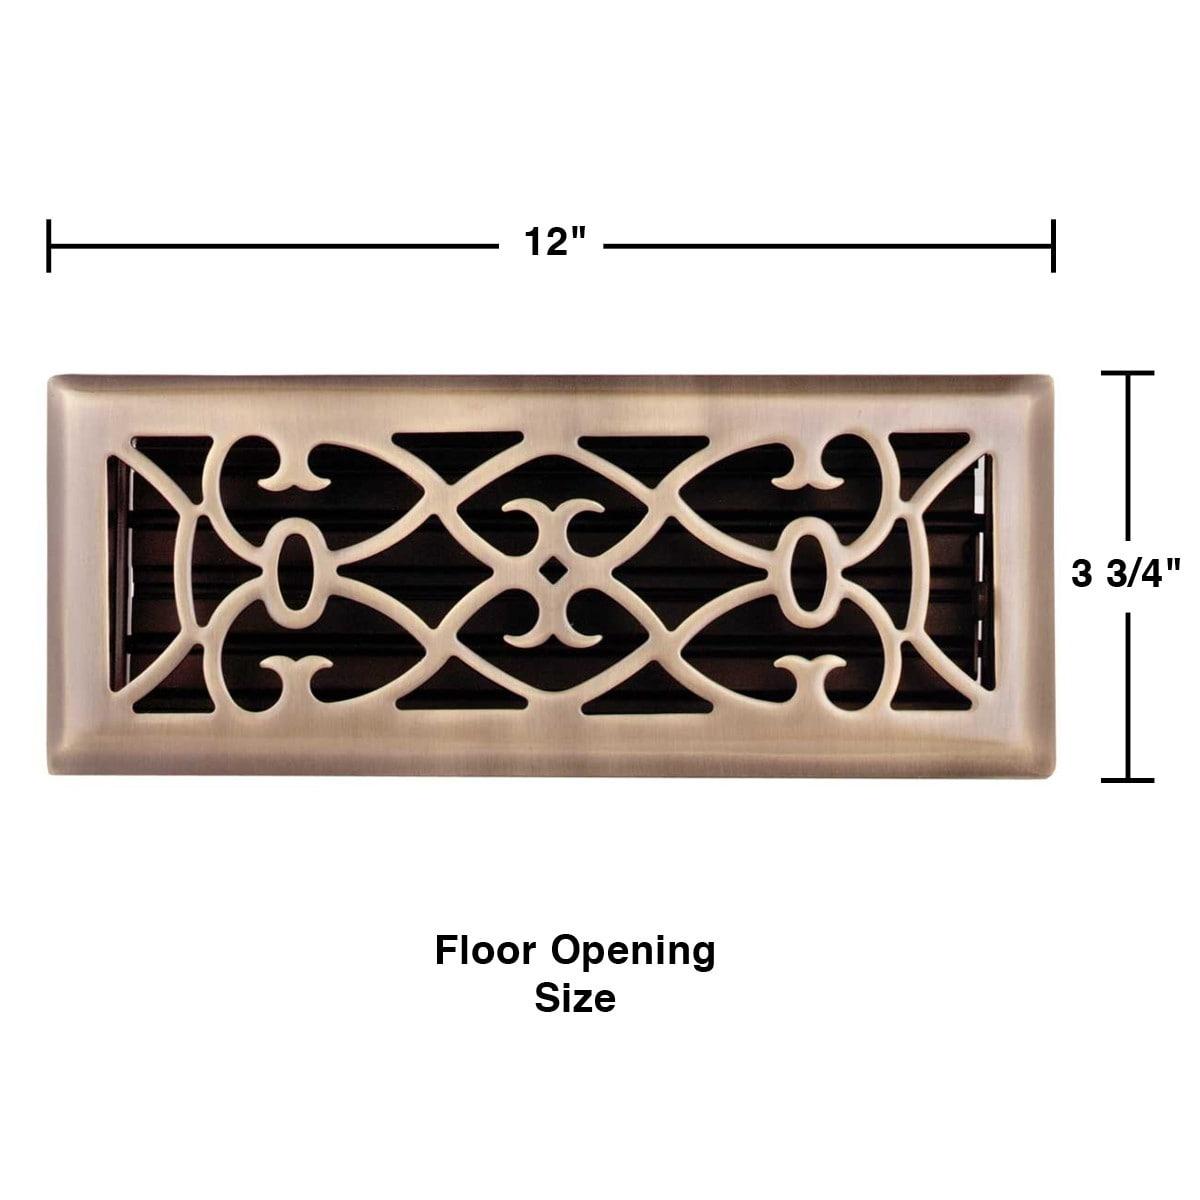 Solid Brass Victorian Scroll 2.25 by 12 Heat Register Metal Floor Vent